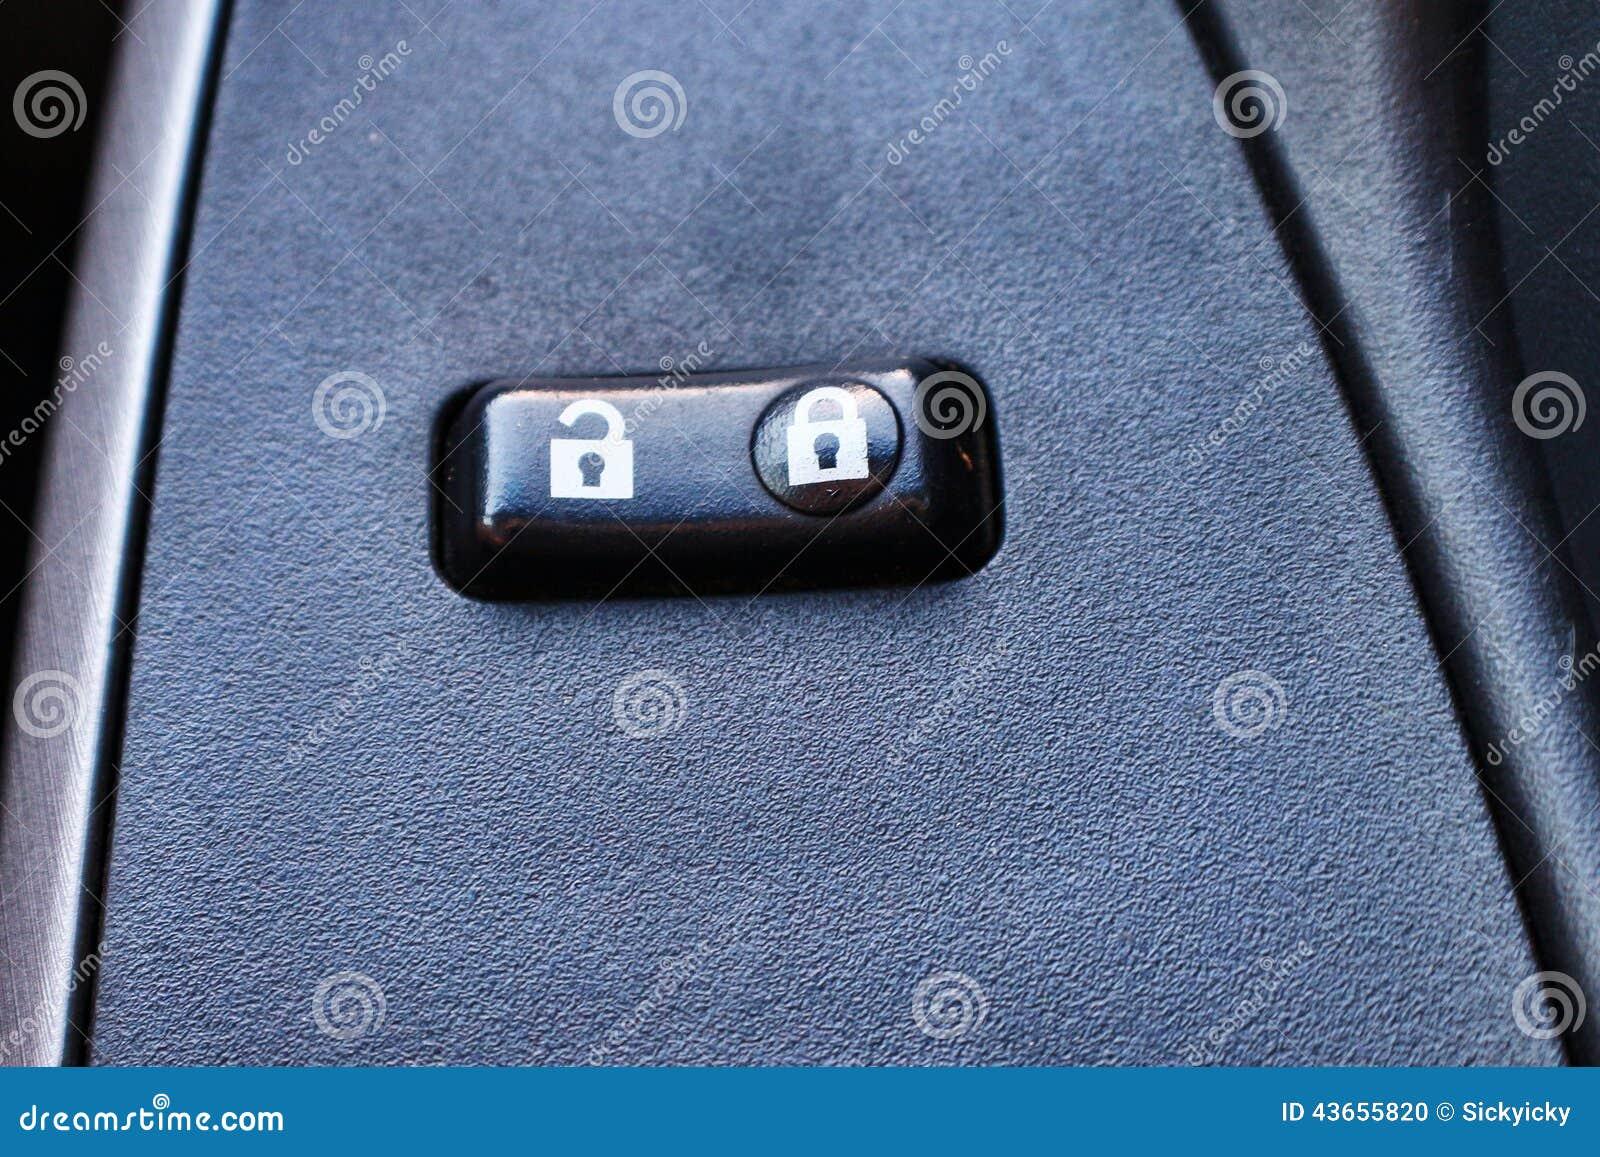 Lock Or Unlock